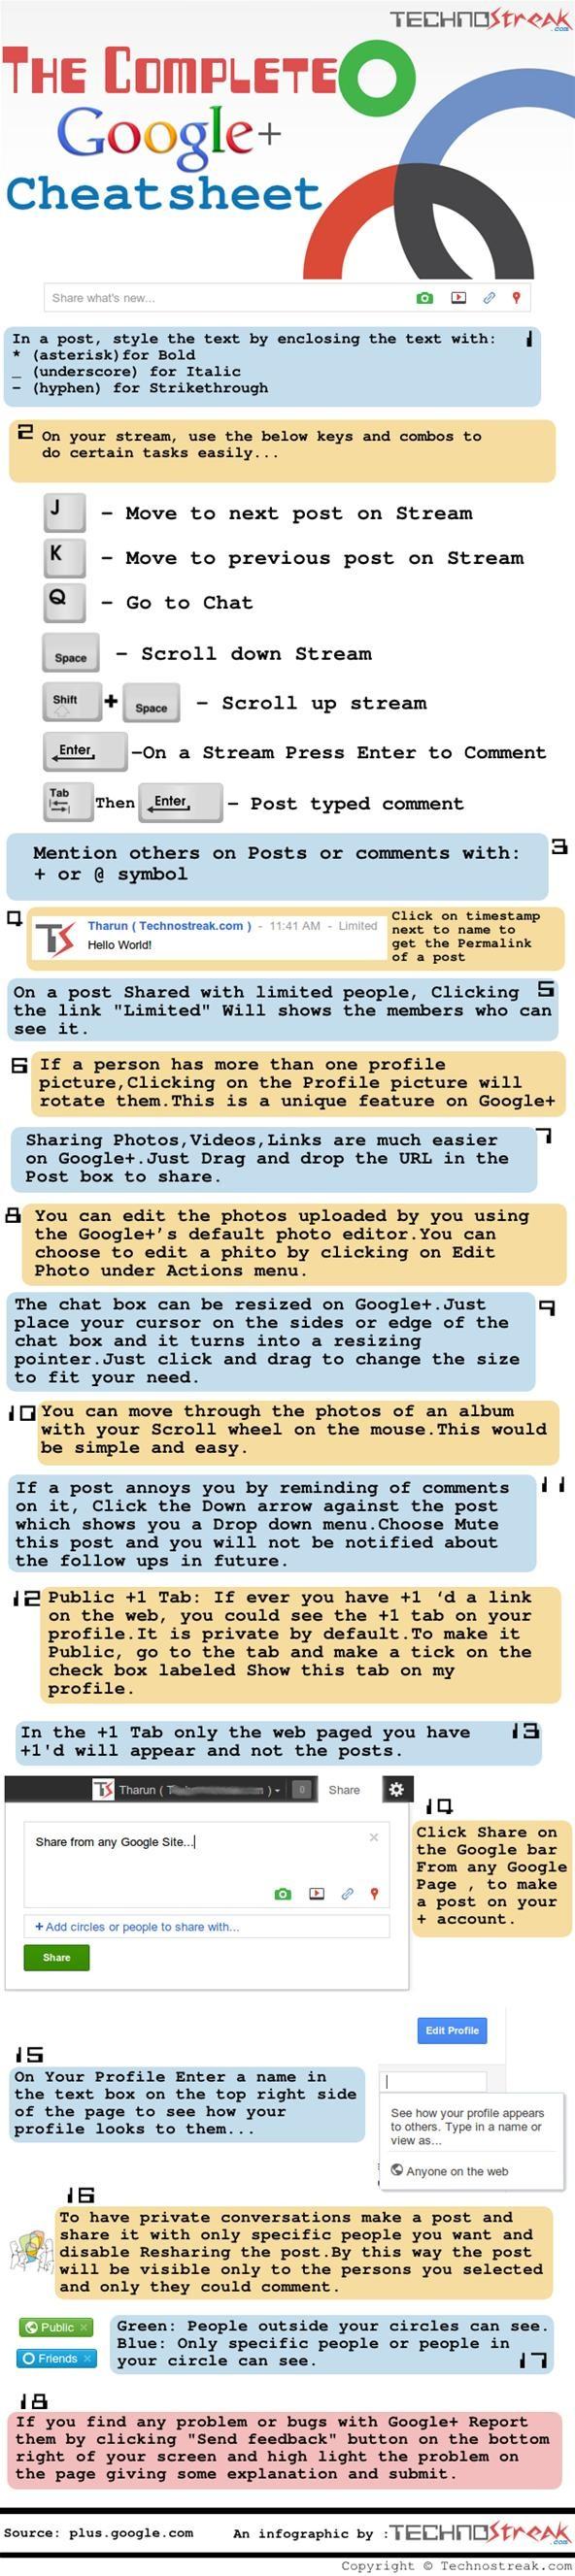 Complete Google+ Cheatsheet